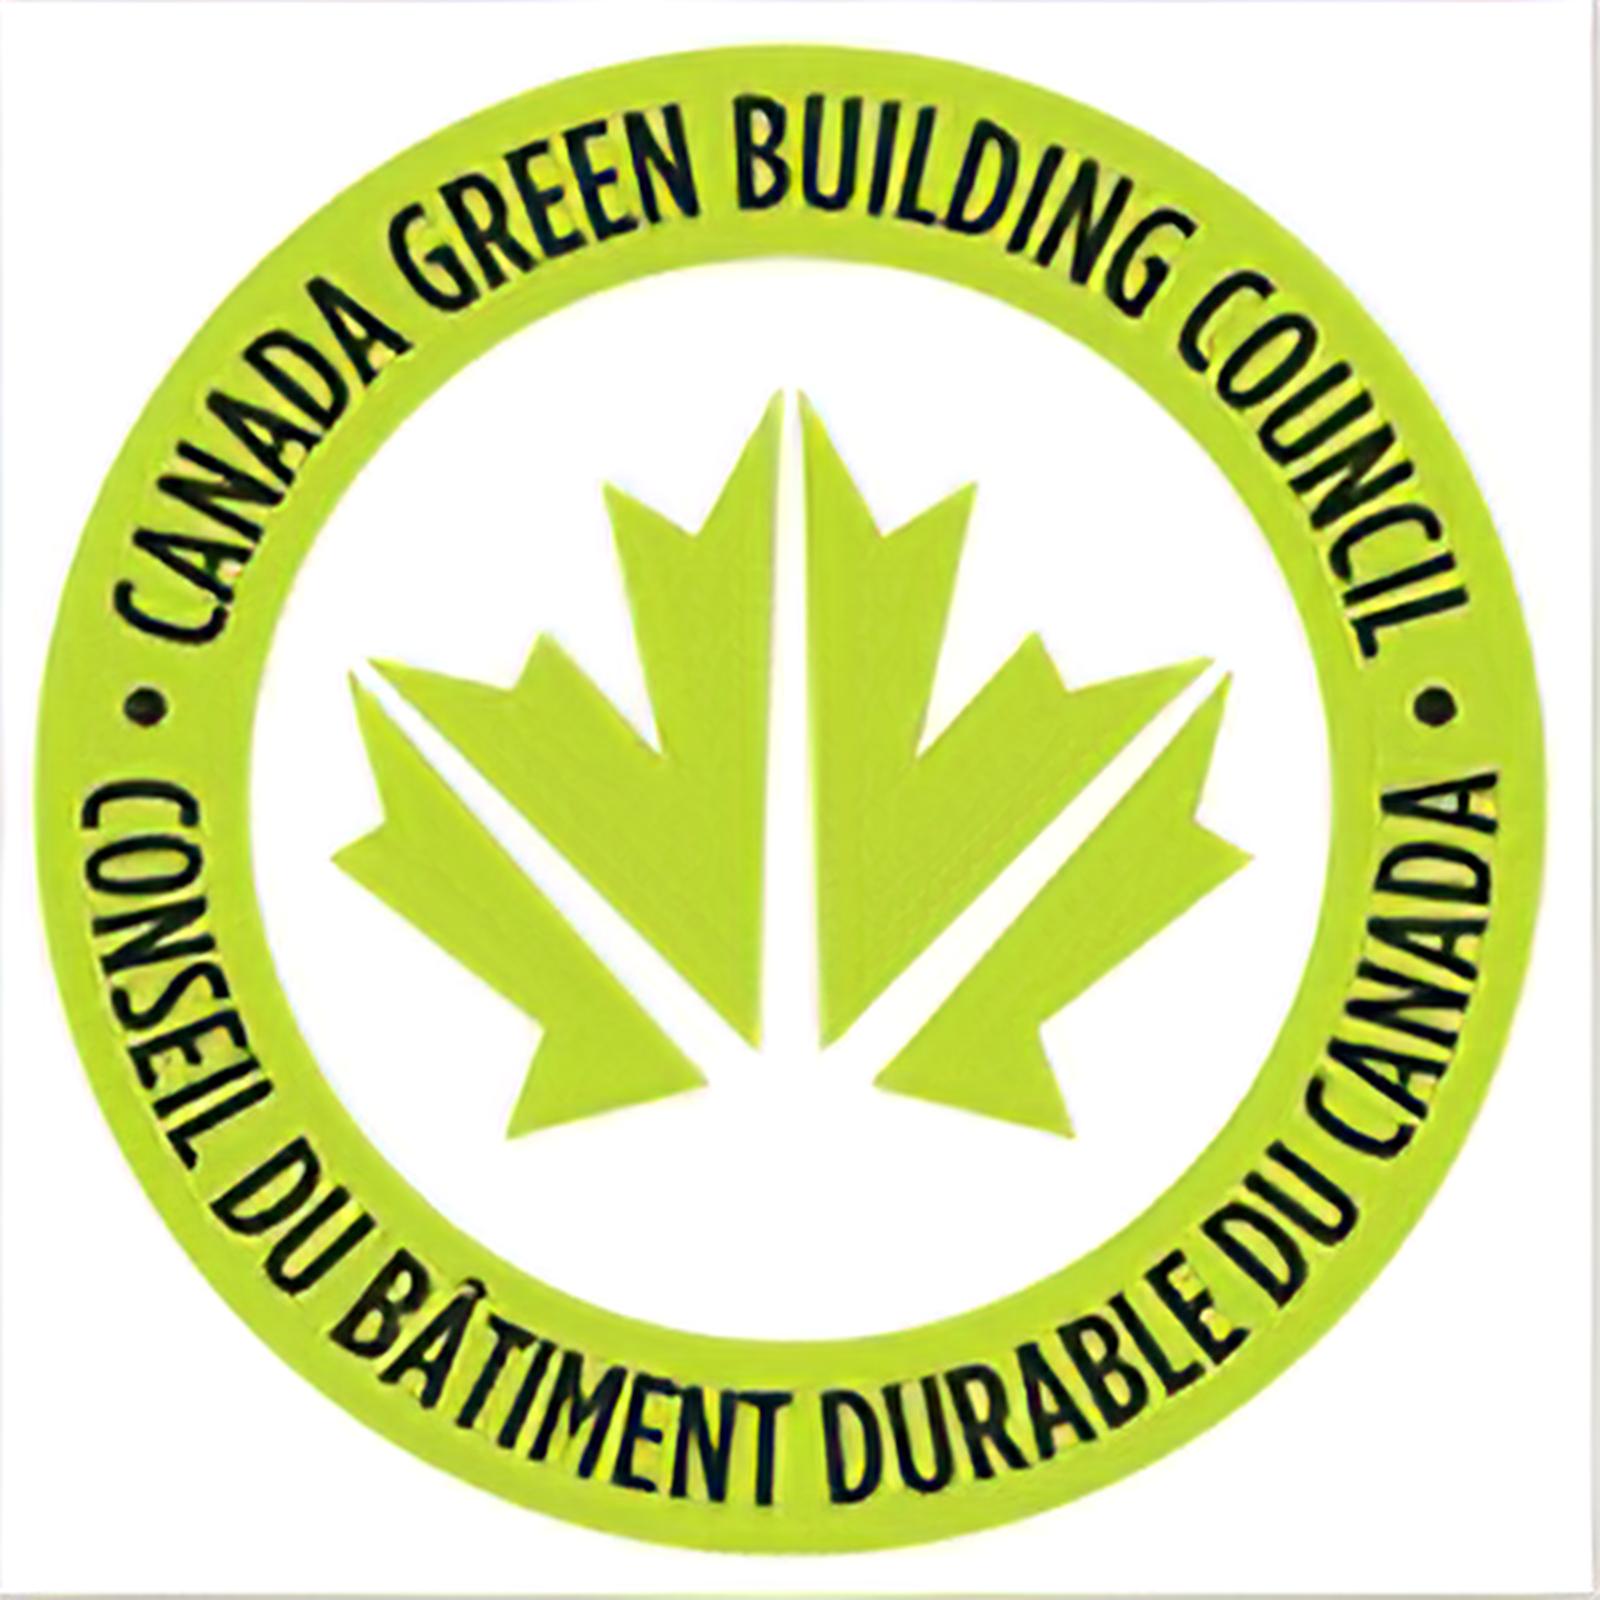 CaGBC Alberta Chapter